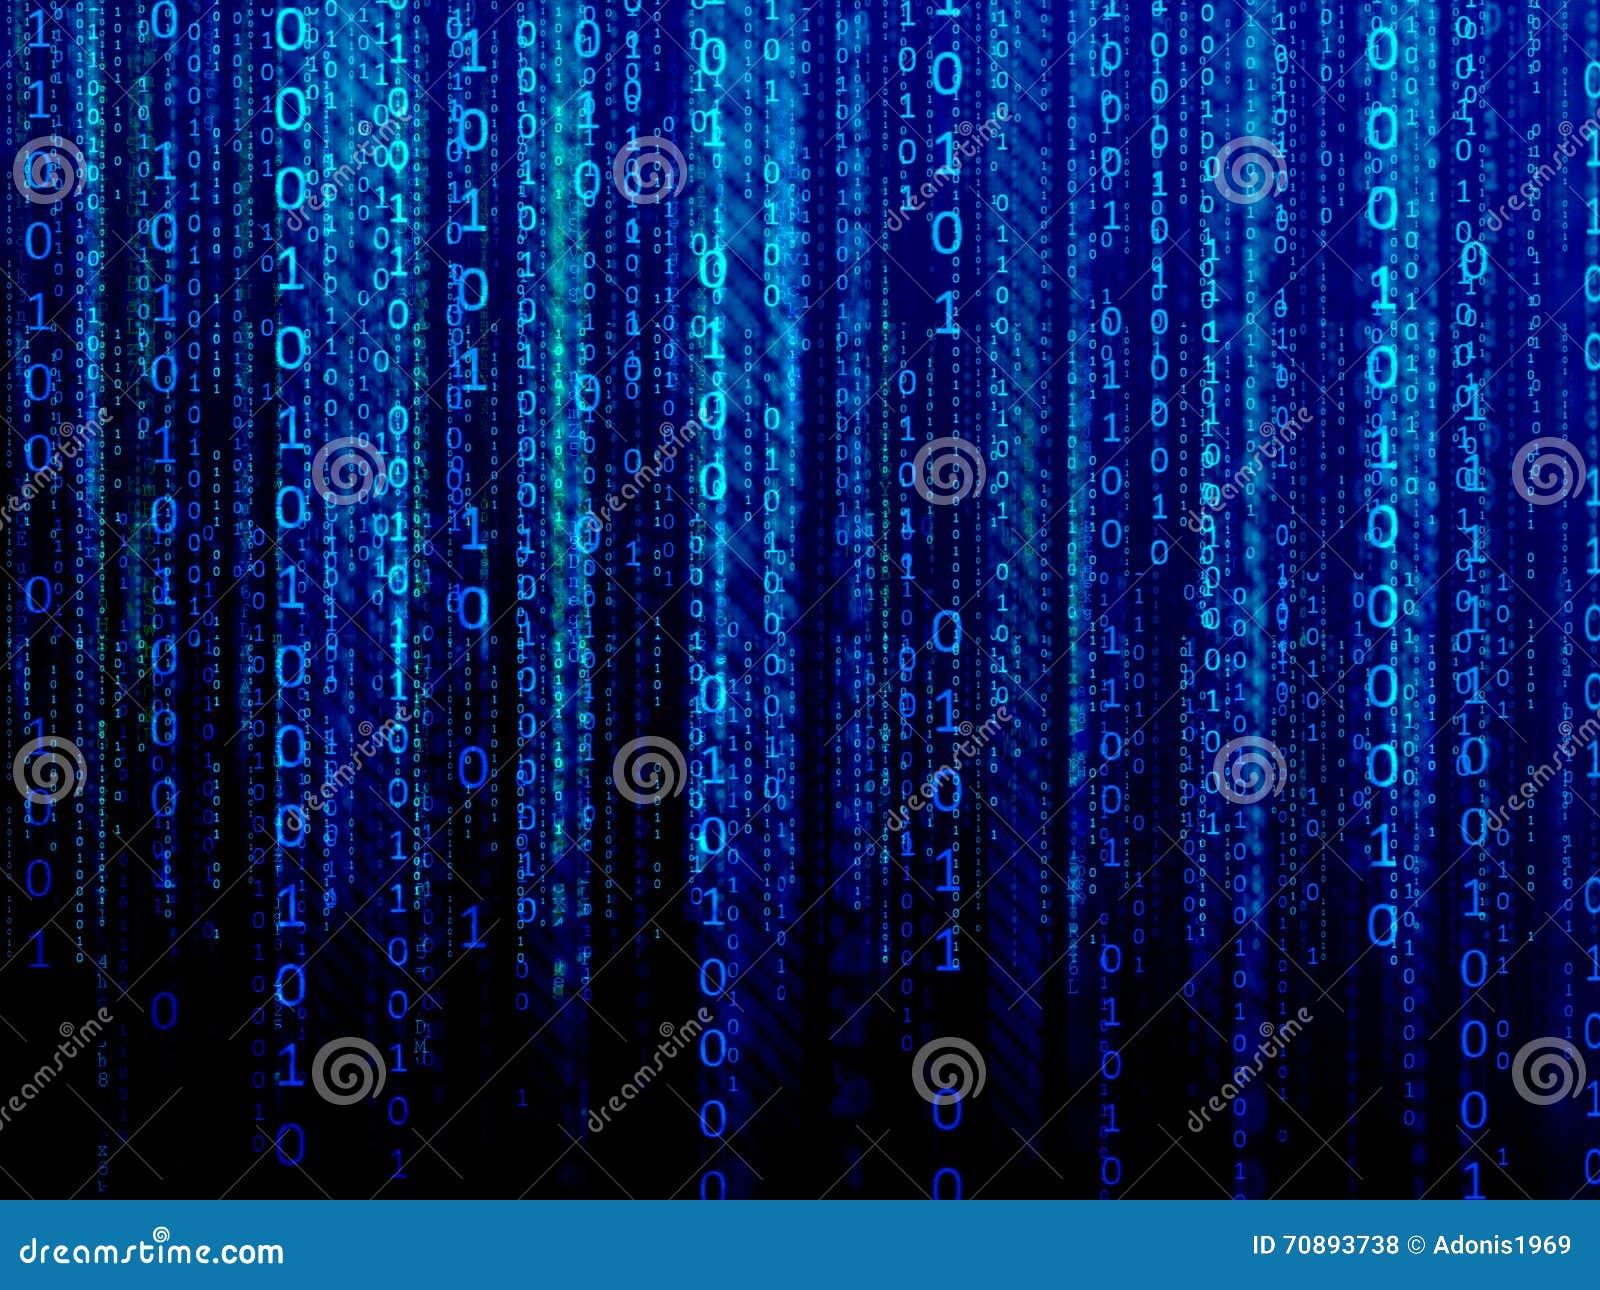 Blue Digital Data Stream Stock Illustration - Image: 70893738